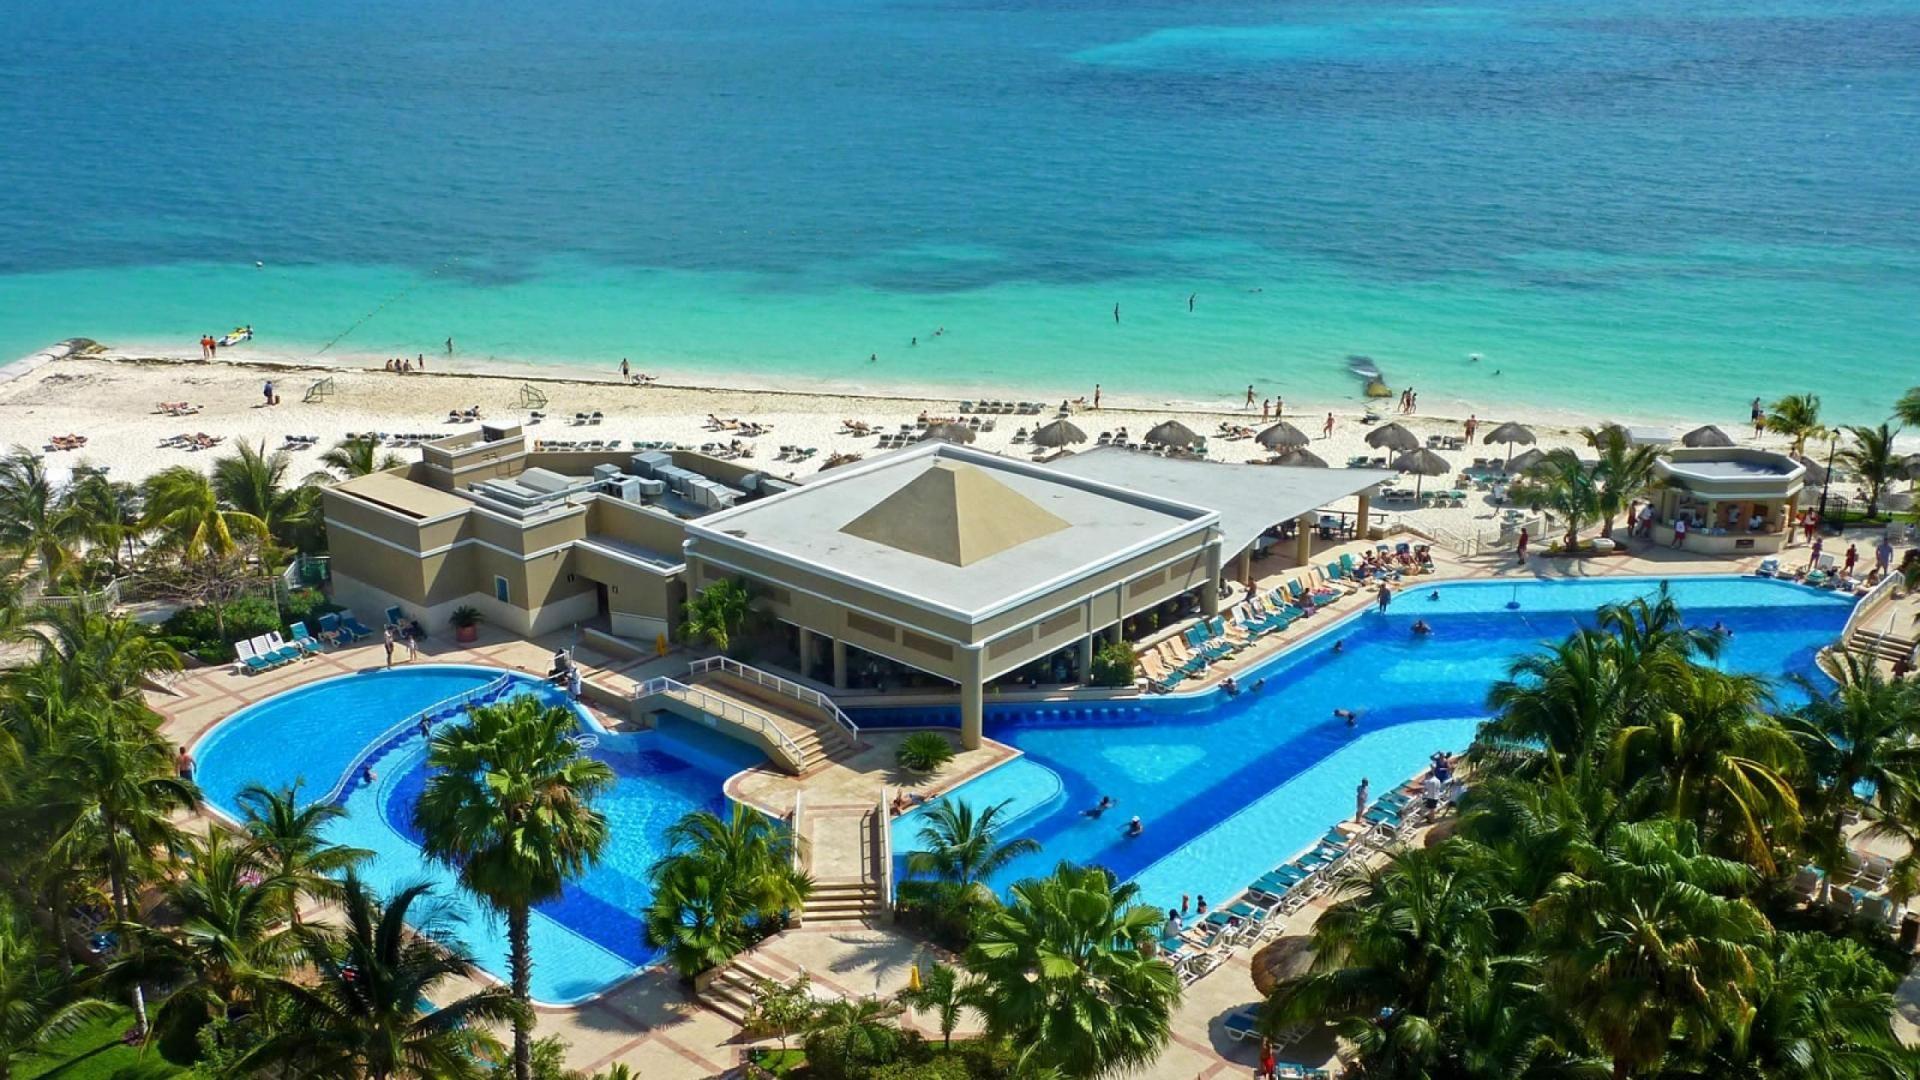 caribbean beach resort hd wallpaper hd pic   beach wallpaper